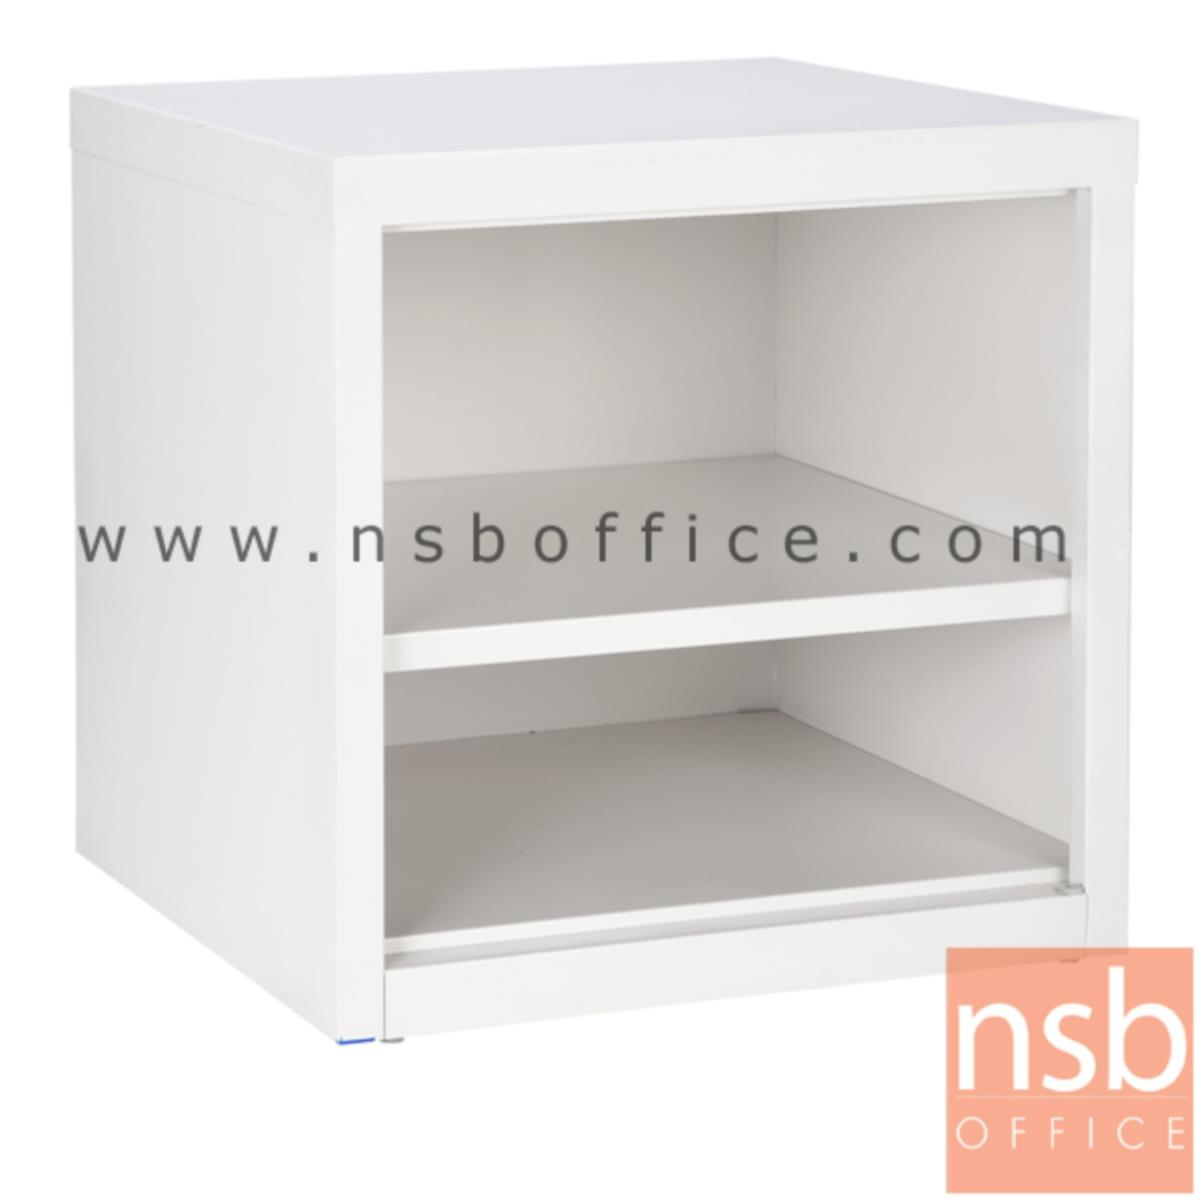 E25A003:ตู้เล็ก 2 ช่องโล่ง สีขาวครีม 44W*40.7D*44H cm. รุ่น UNI-3